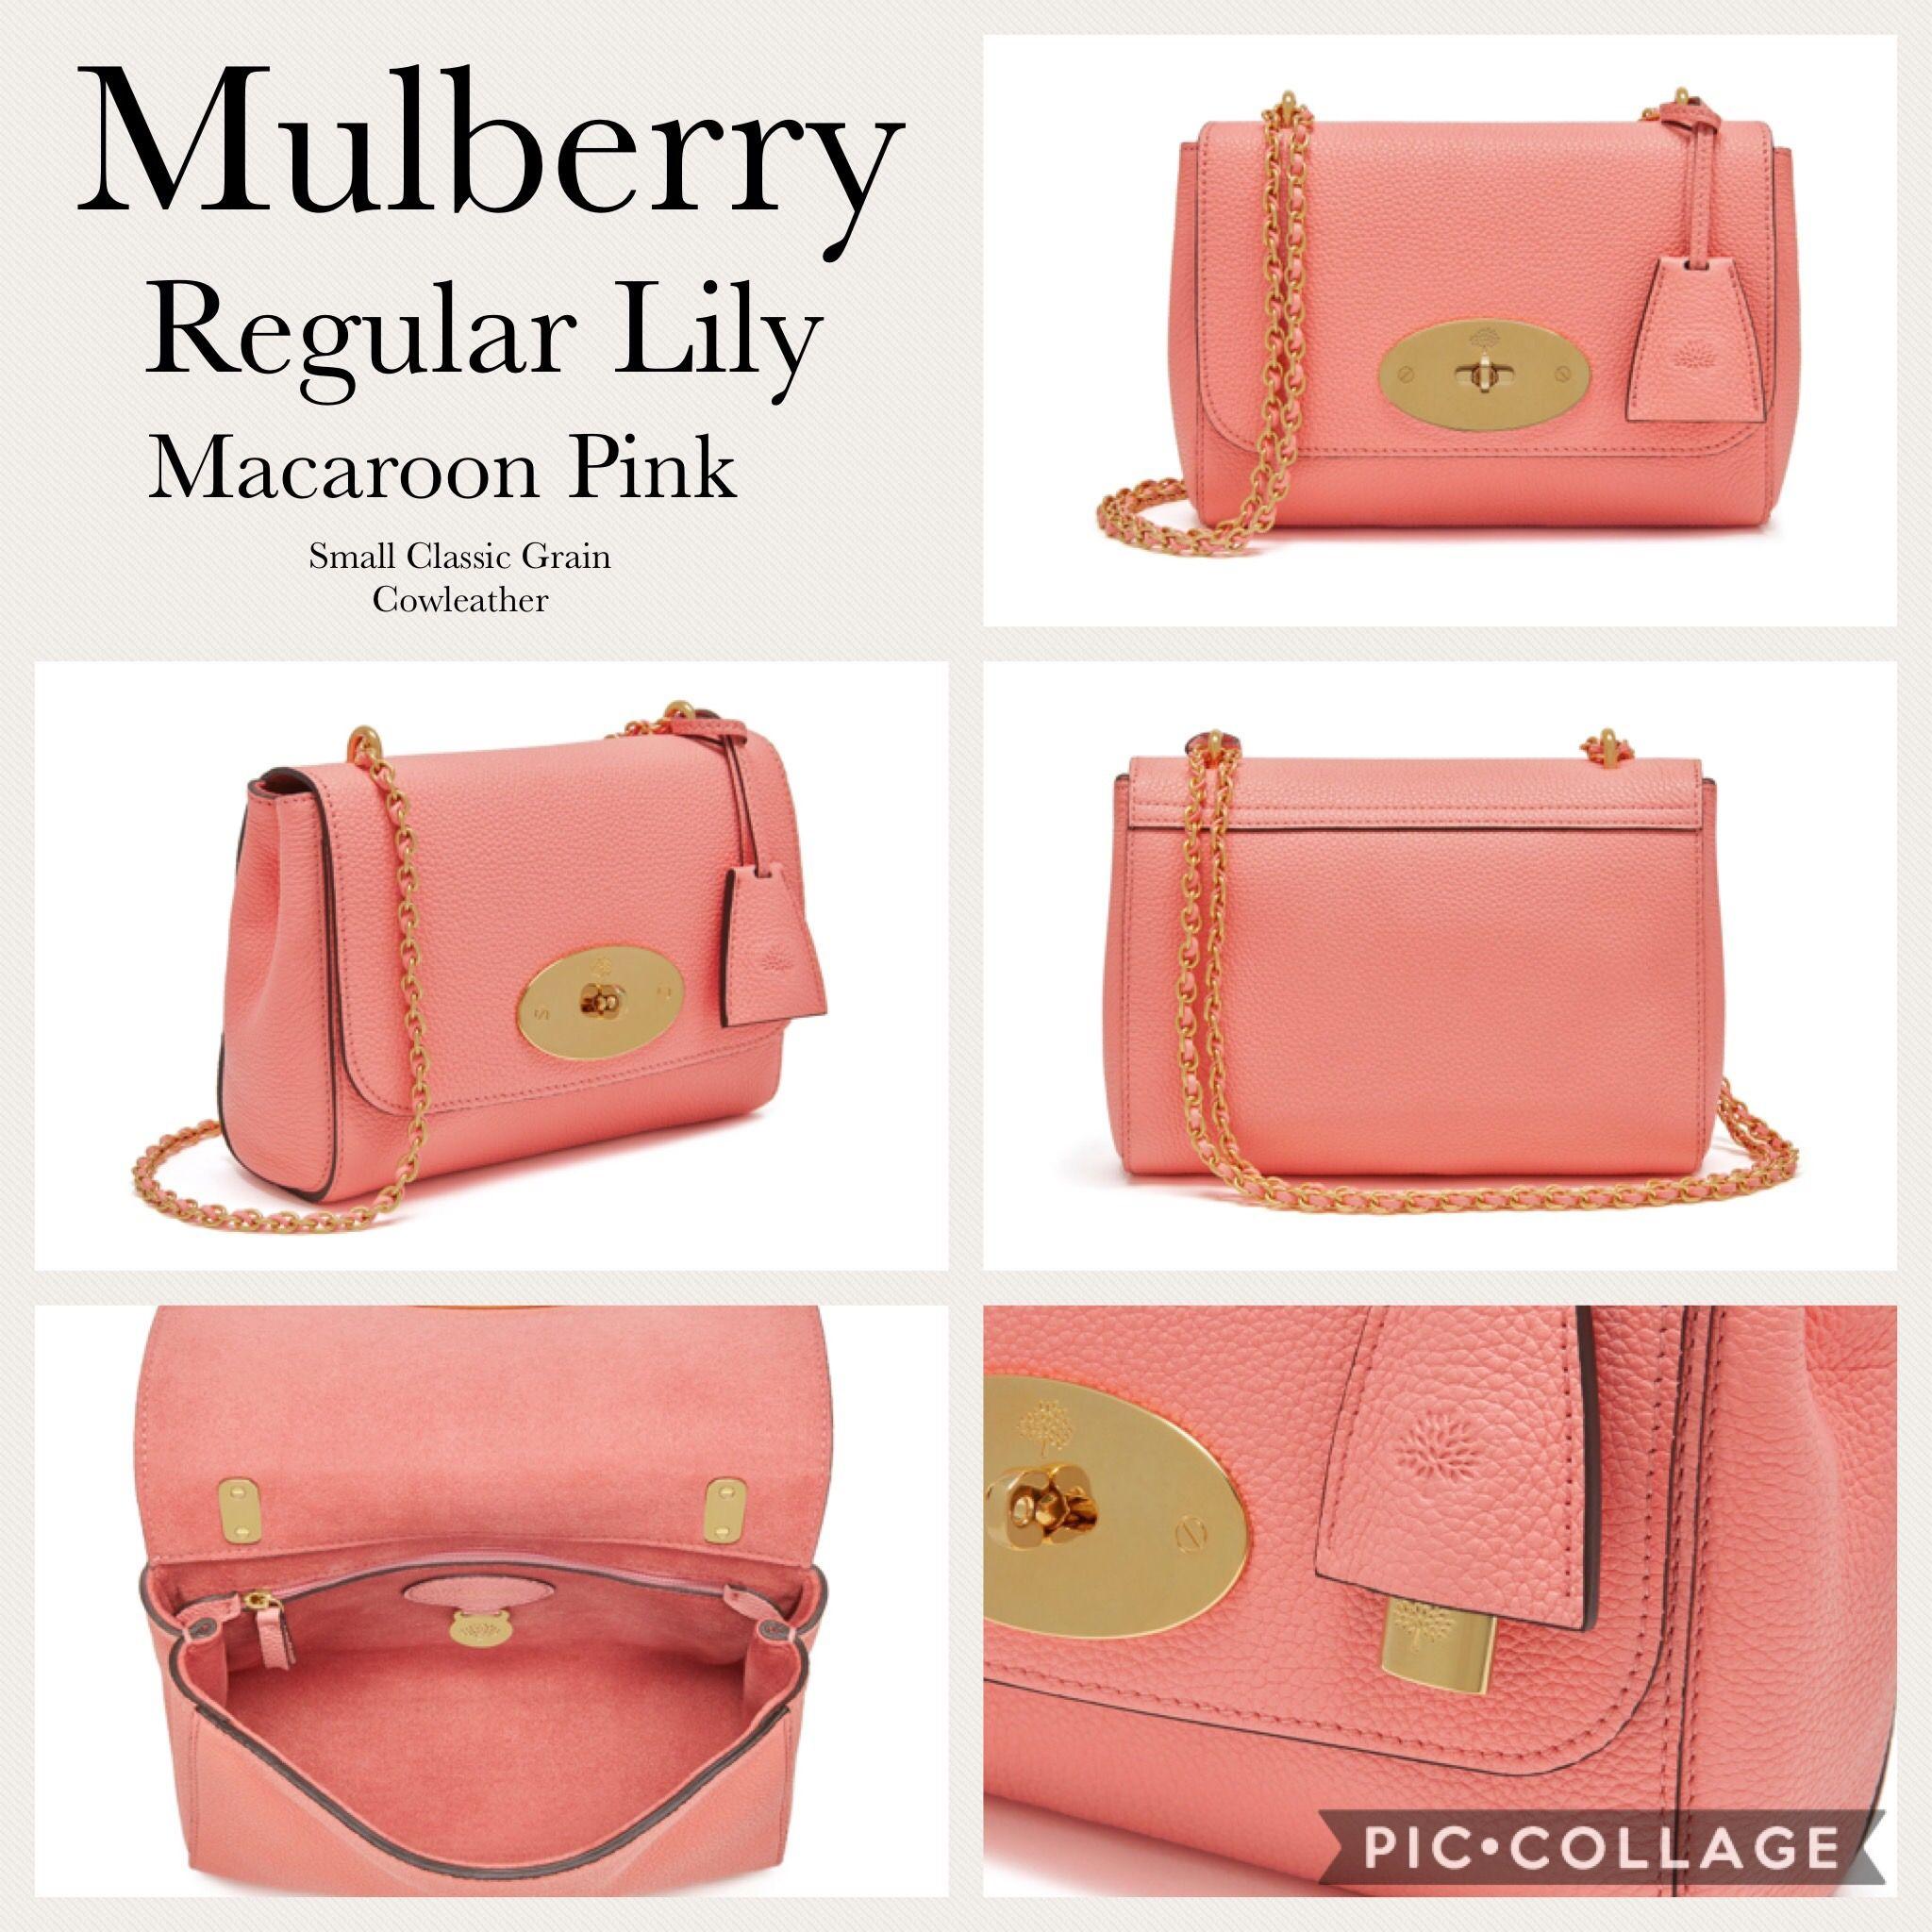 Mulberry Lily 0c1e93d217c38